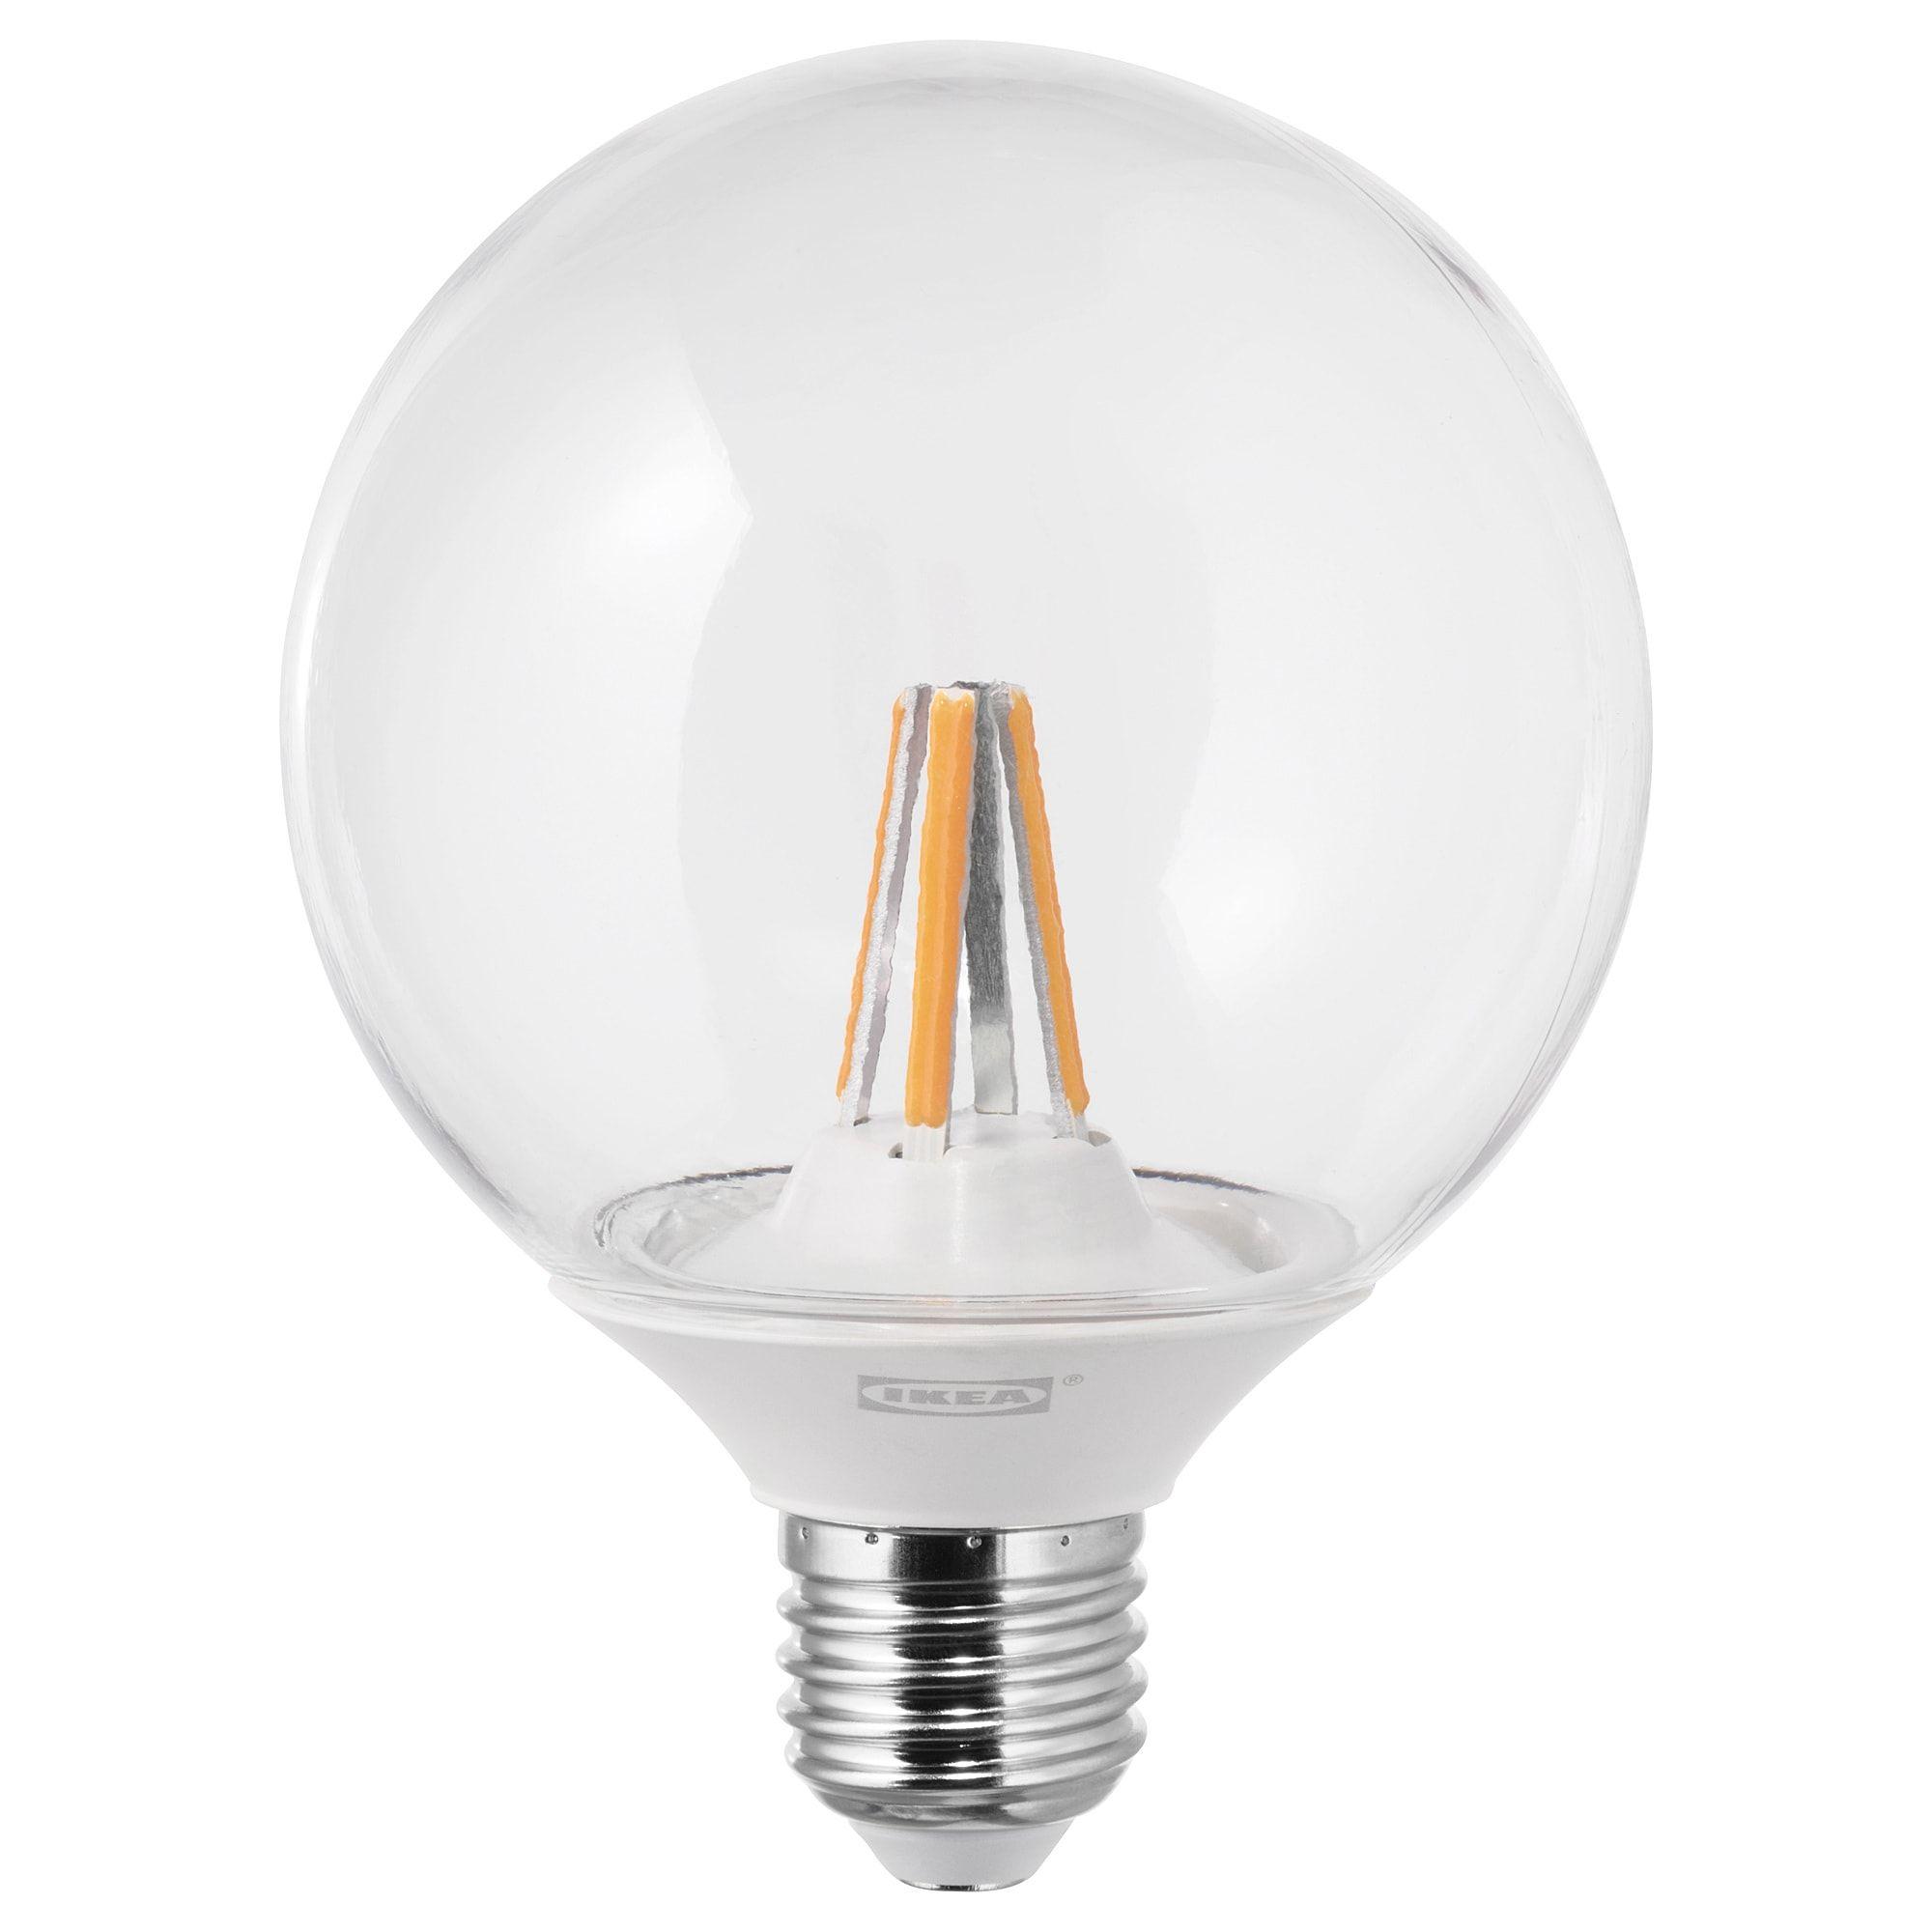 NITTIO LED Leuchtmittel E27 20 lm rund kupferfarben IKEA